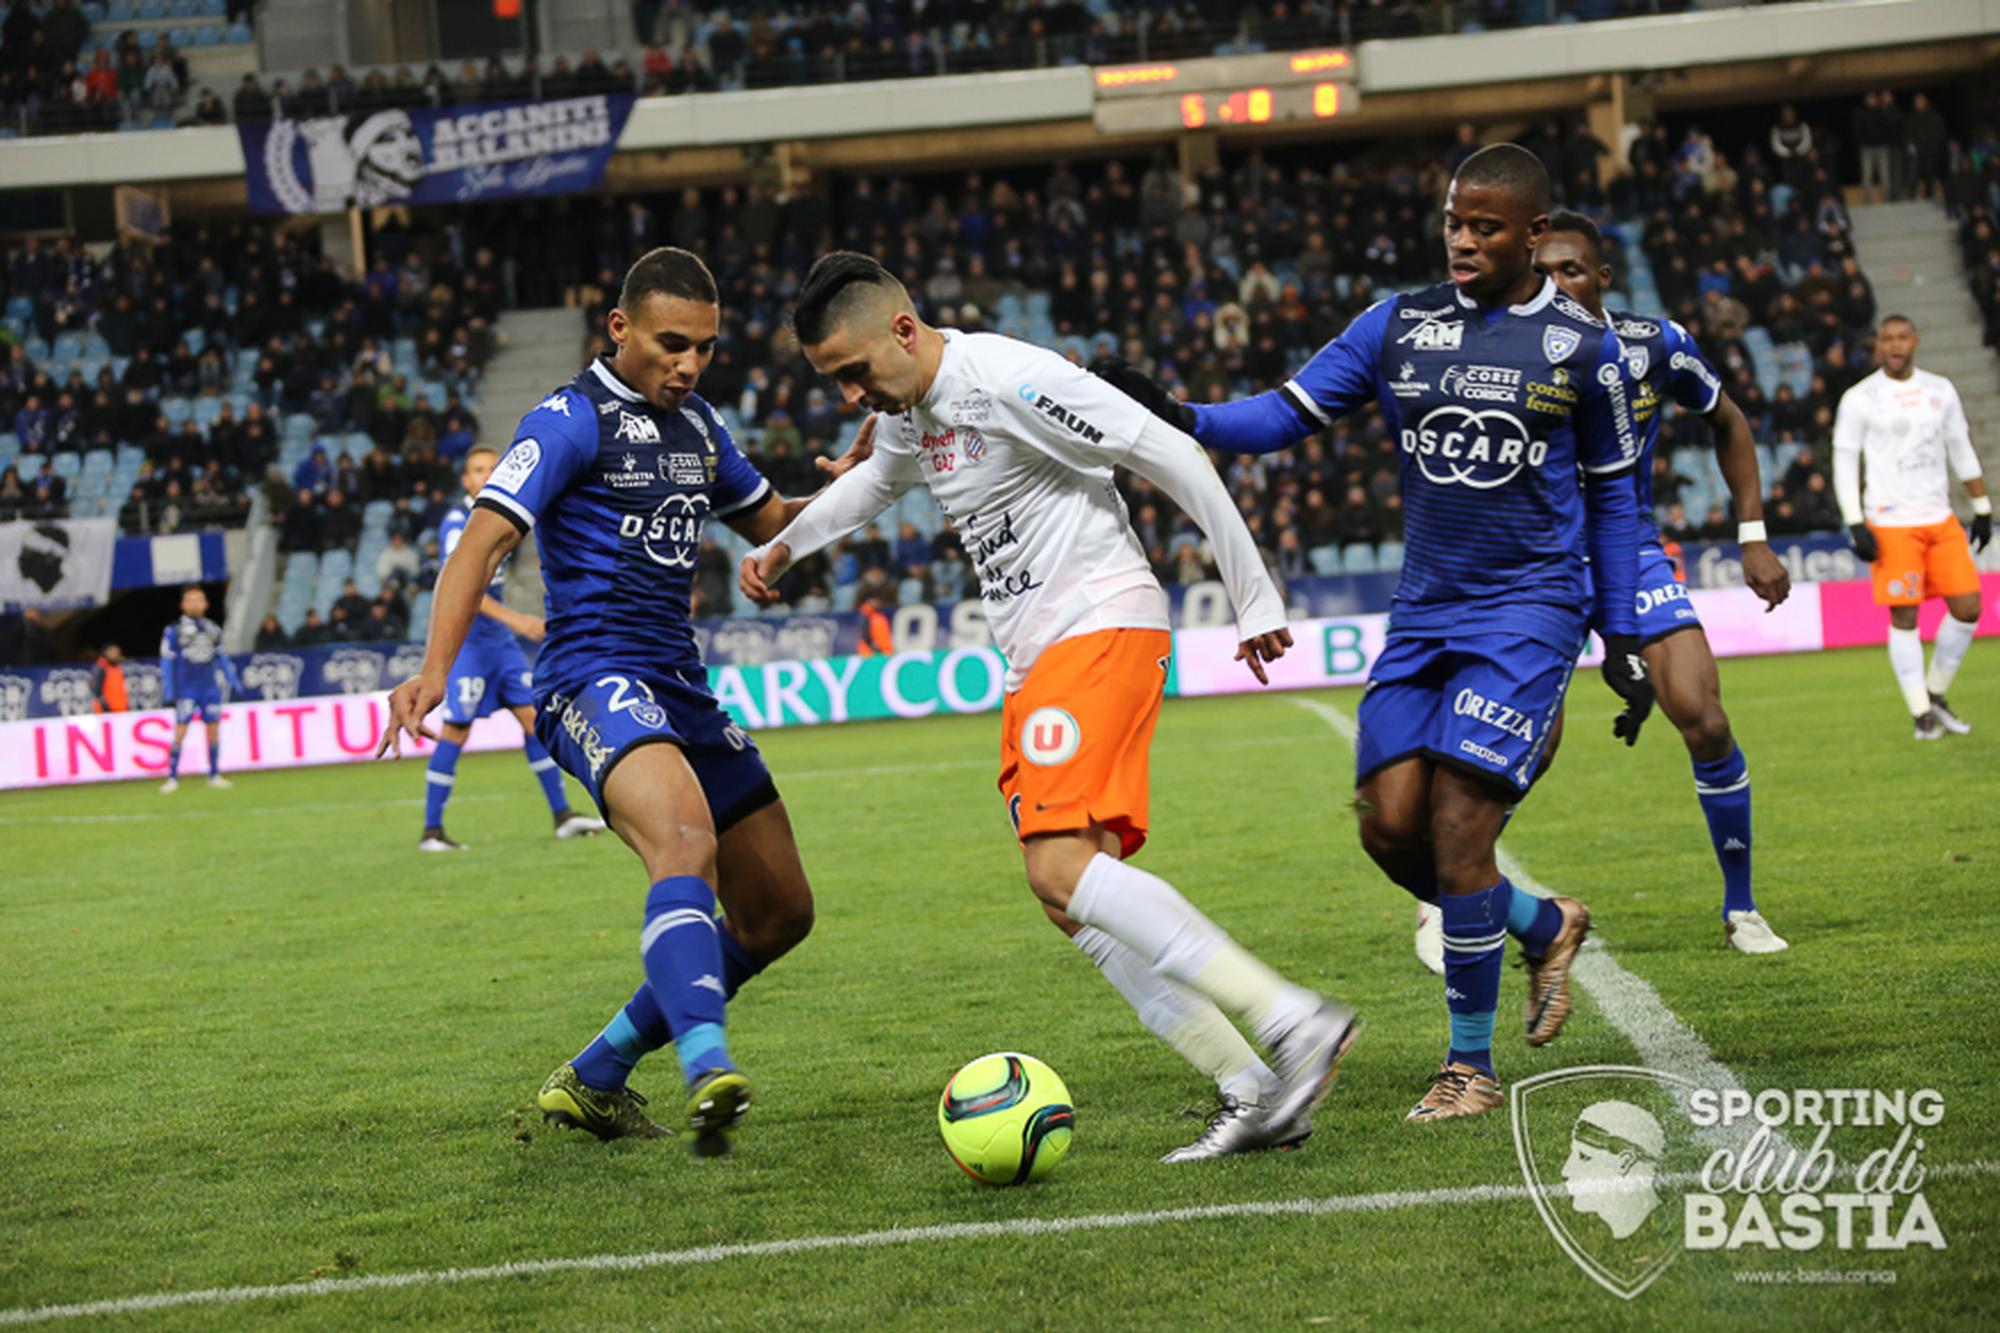 Bastia - Montpellier